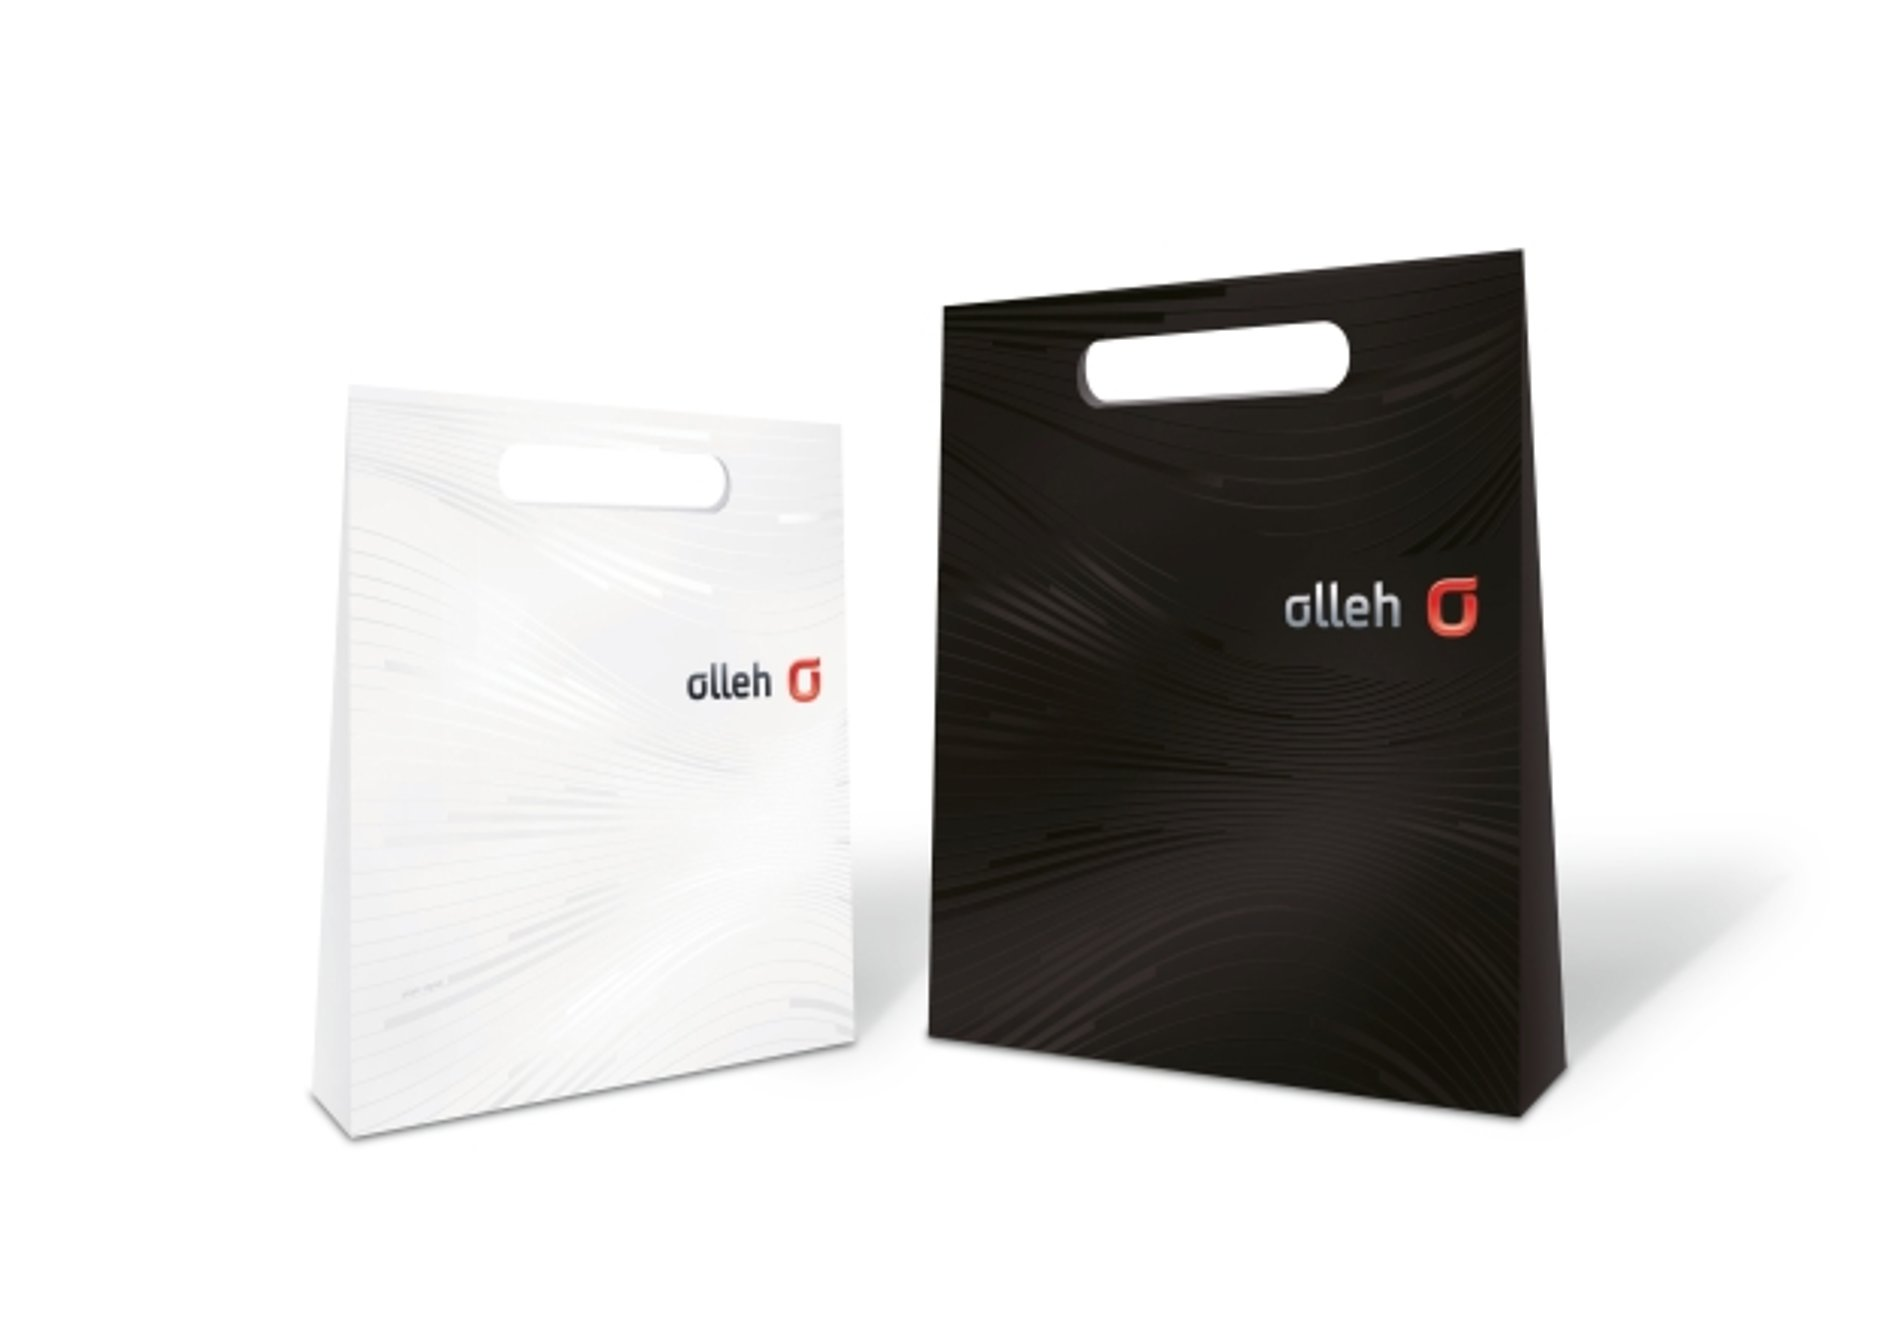 olleh signal | Red Dot Design Award